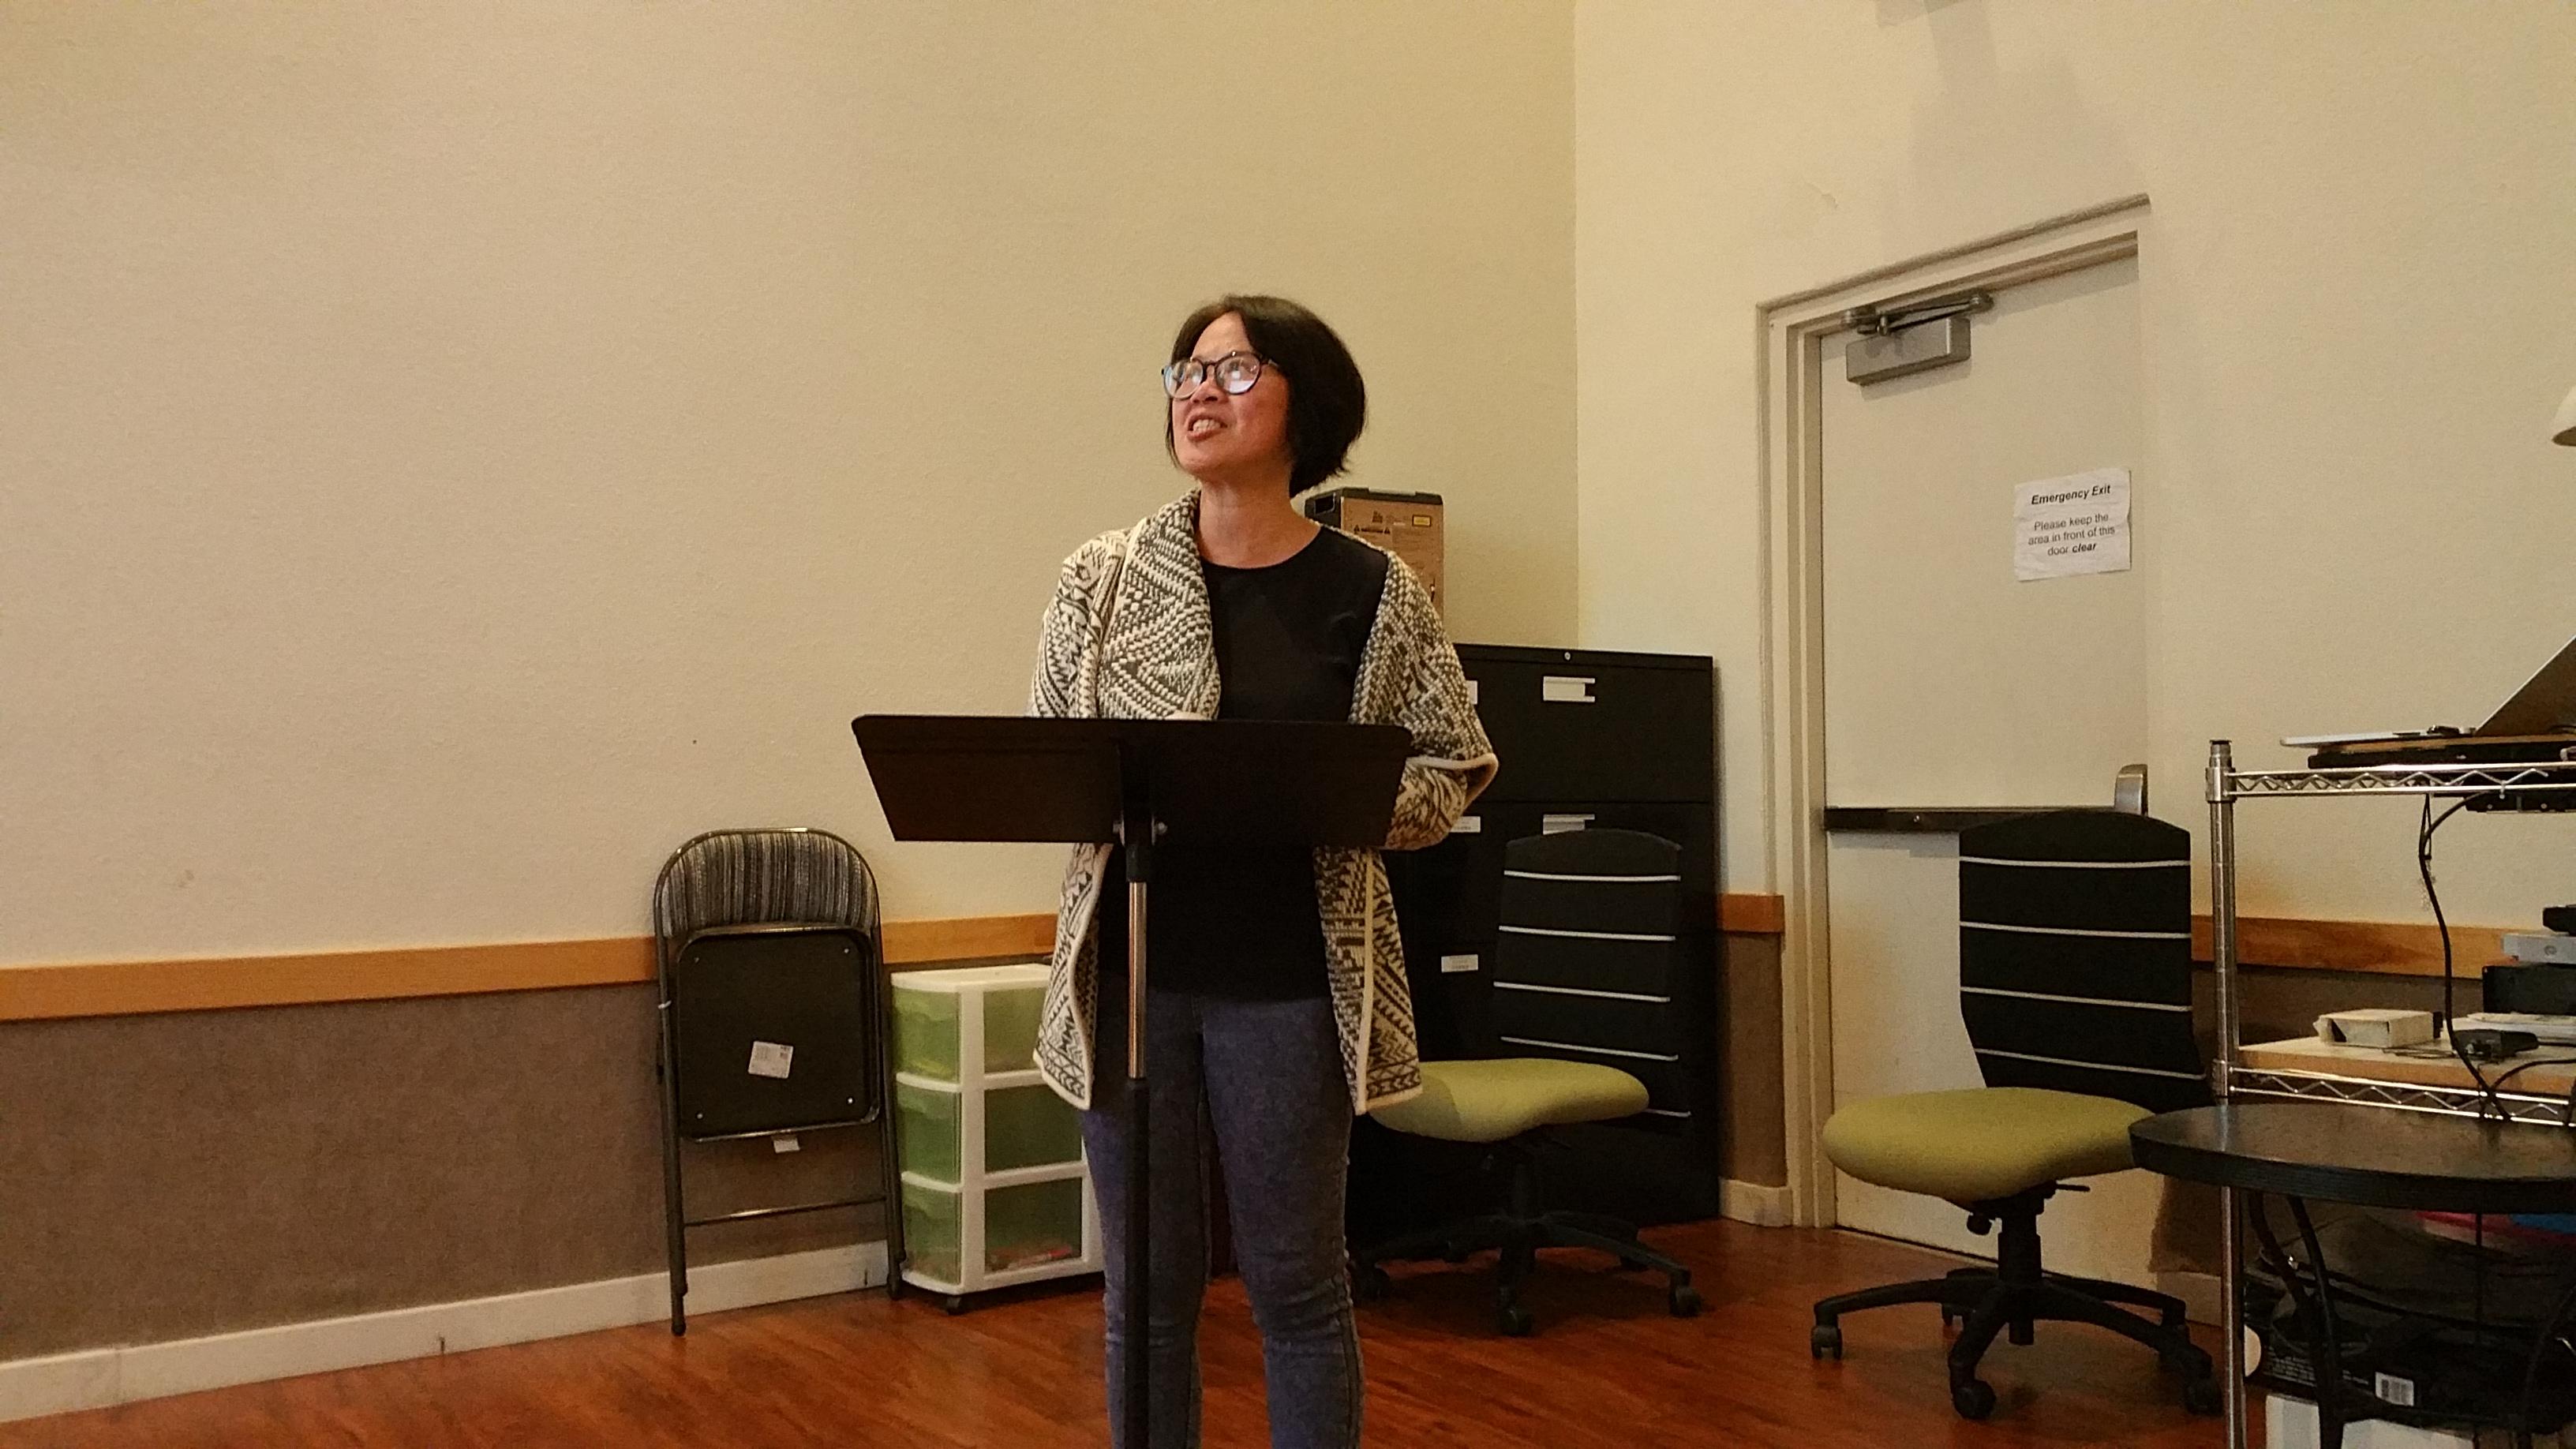 Anita在12日周三祷告会分享《祷告是宣教》,以及她带领的丰收教会的拓展情况!